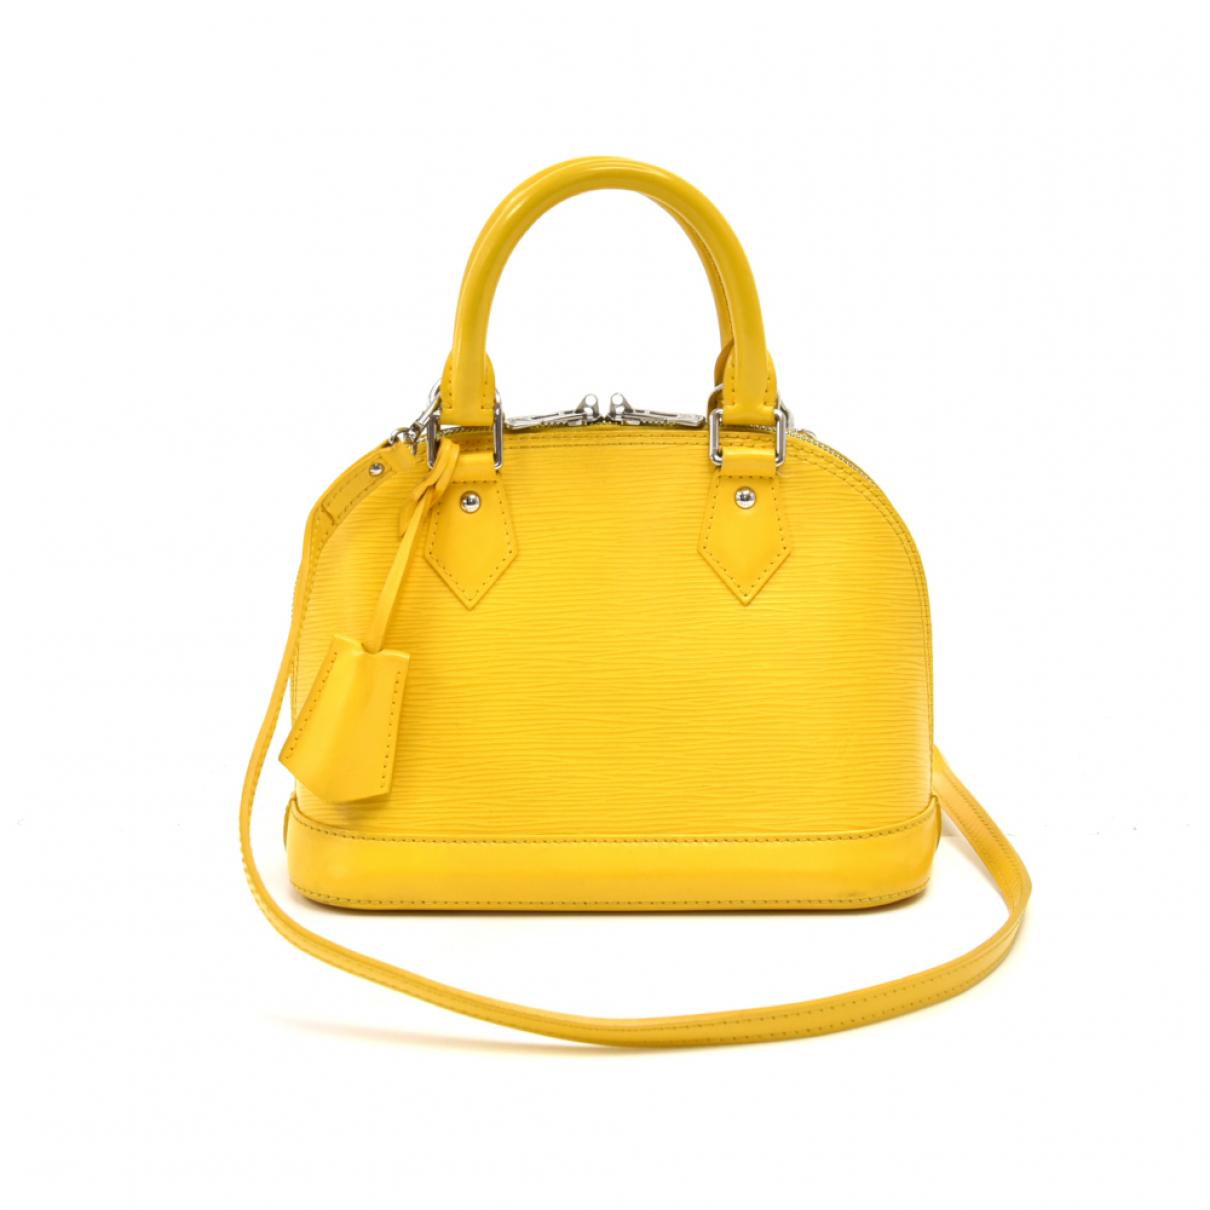 Louis Vuitton - Sac a main Alma pour femme en cuir - jaune